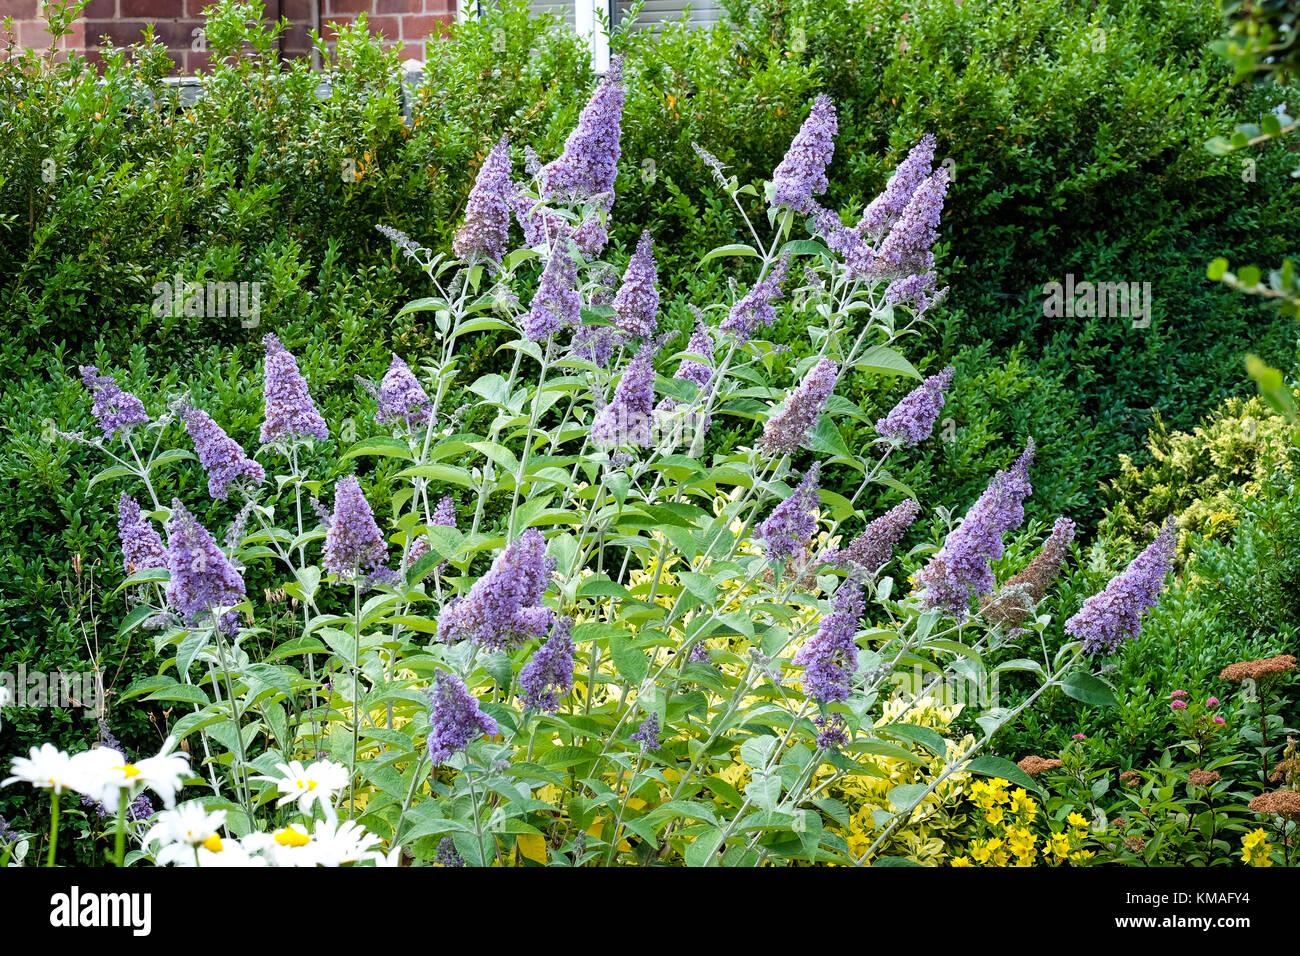 buddleia bush flowering in summer - Stock Image